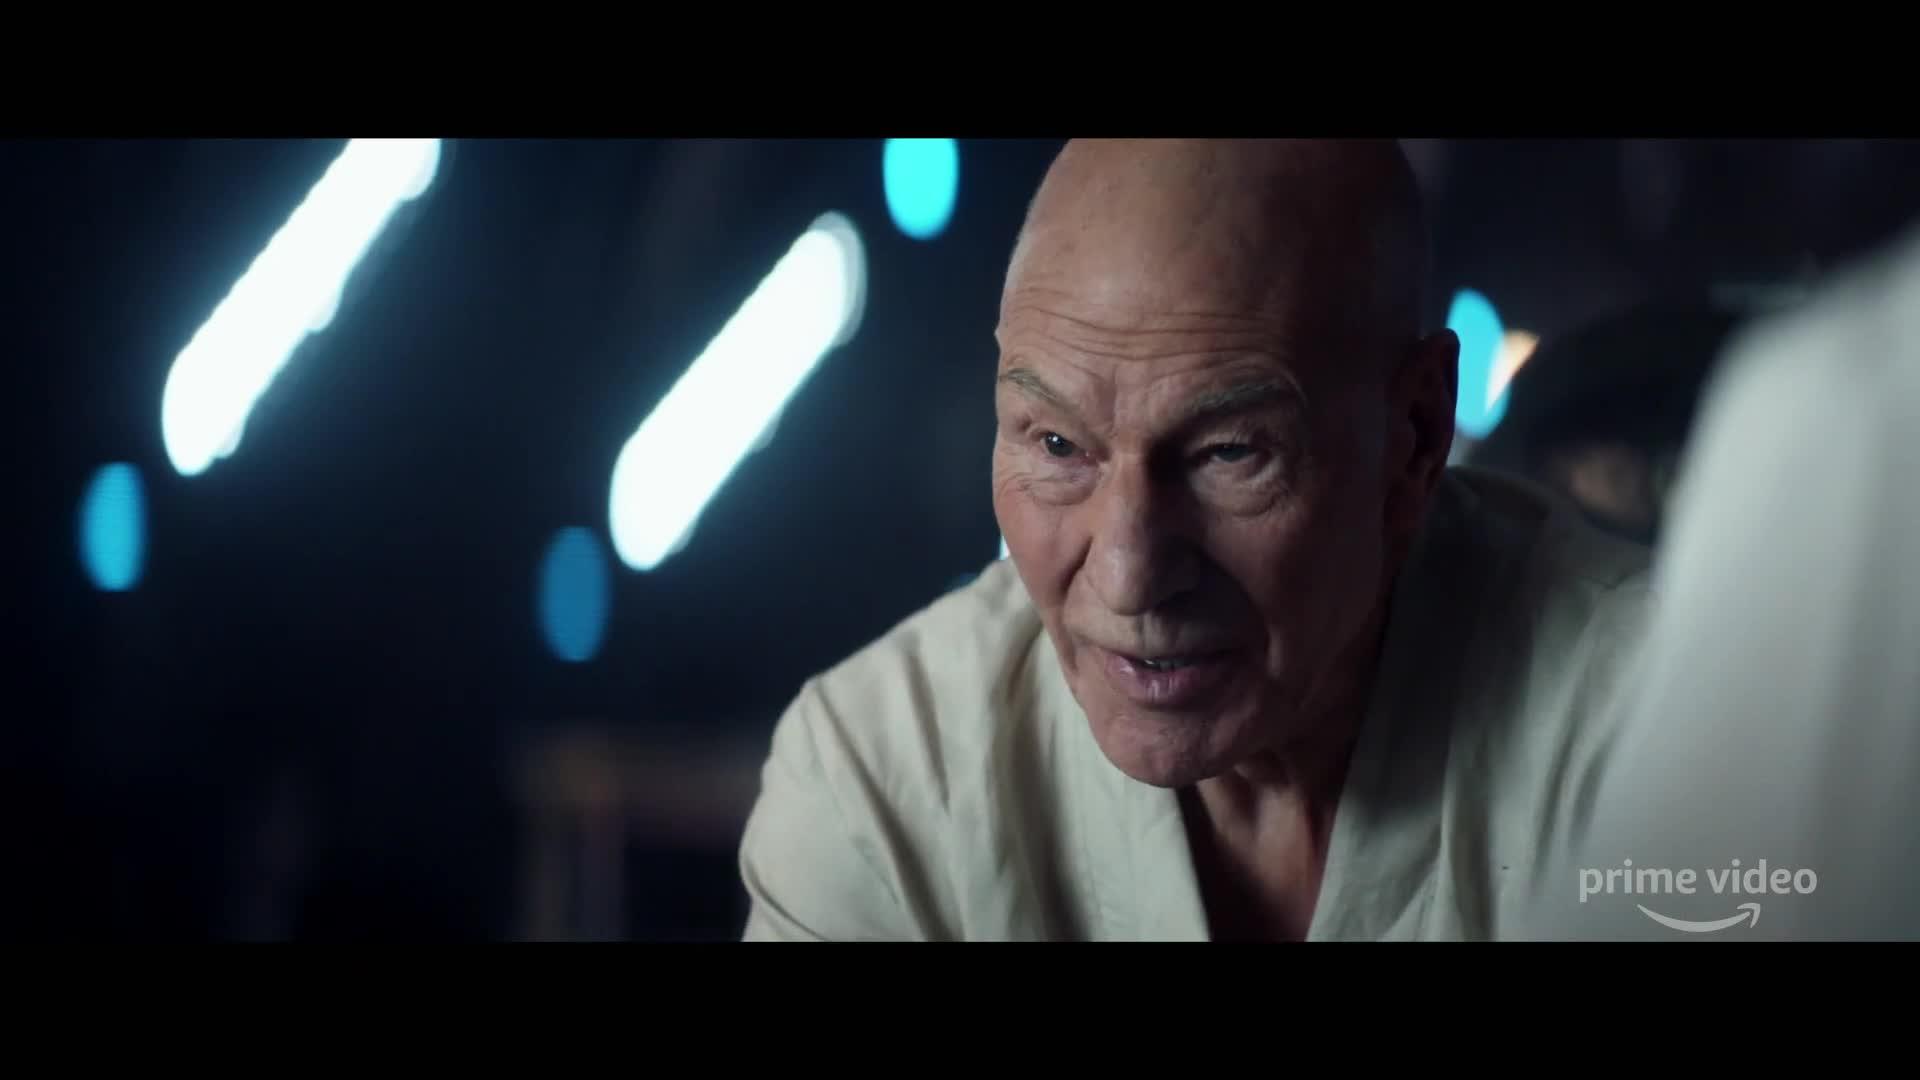 Trailer, Amazon, Serie, Amazon Prime, Teaser, Star Trek, Amazon Prime Video, Prime Video, Jean Luc Picard, Picard, Star Trek Picard, Star Trek:Picard